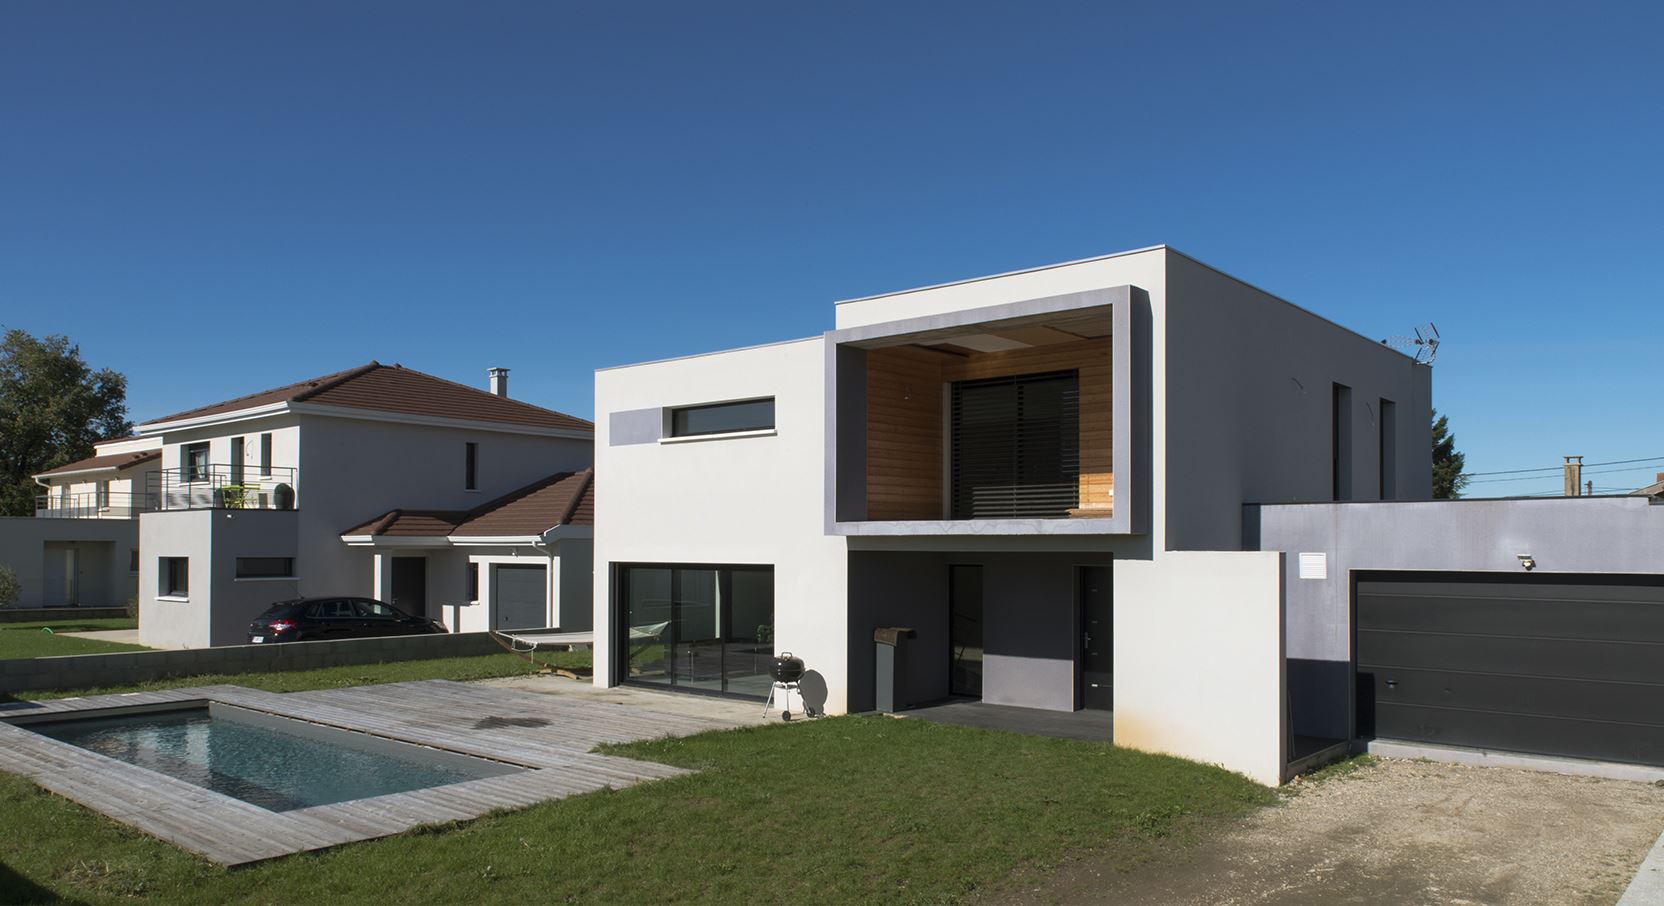 architecte maison contemporaine nice ventana blog. Black Bedroom Furniture Sets. Home Design Ideas